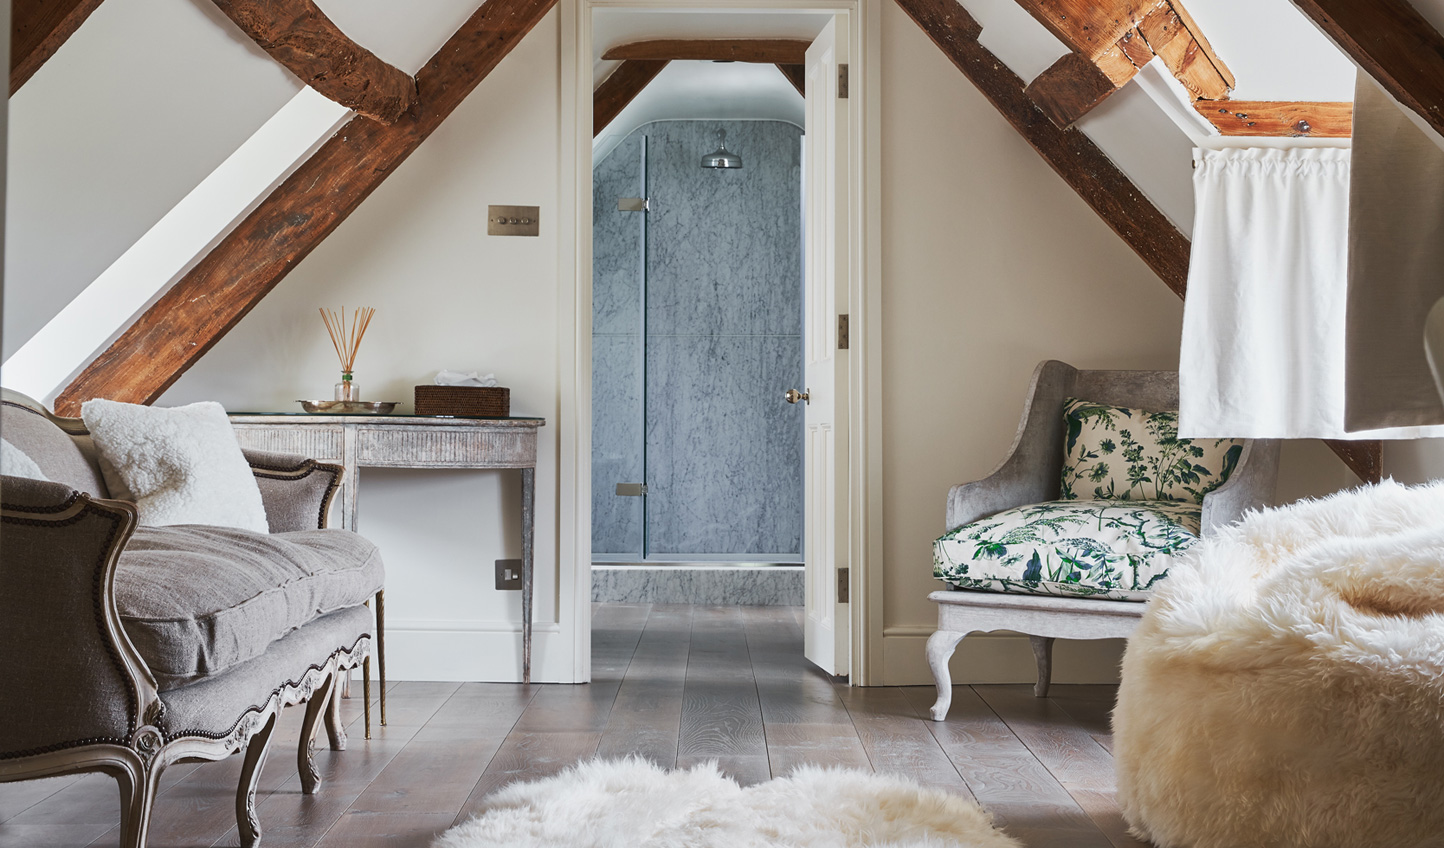 Charming decor creates cosy spaces